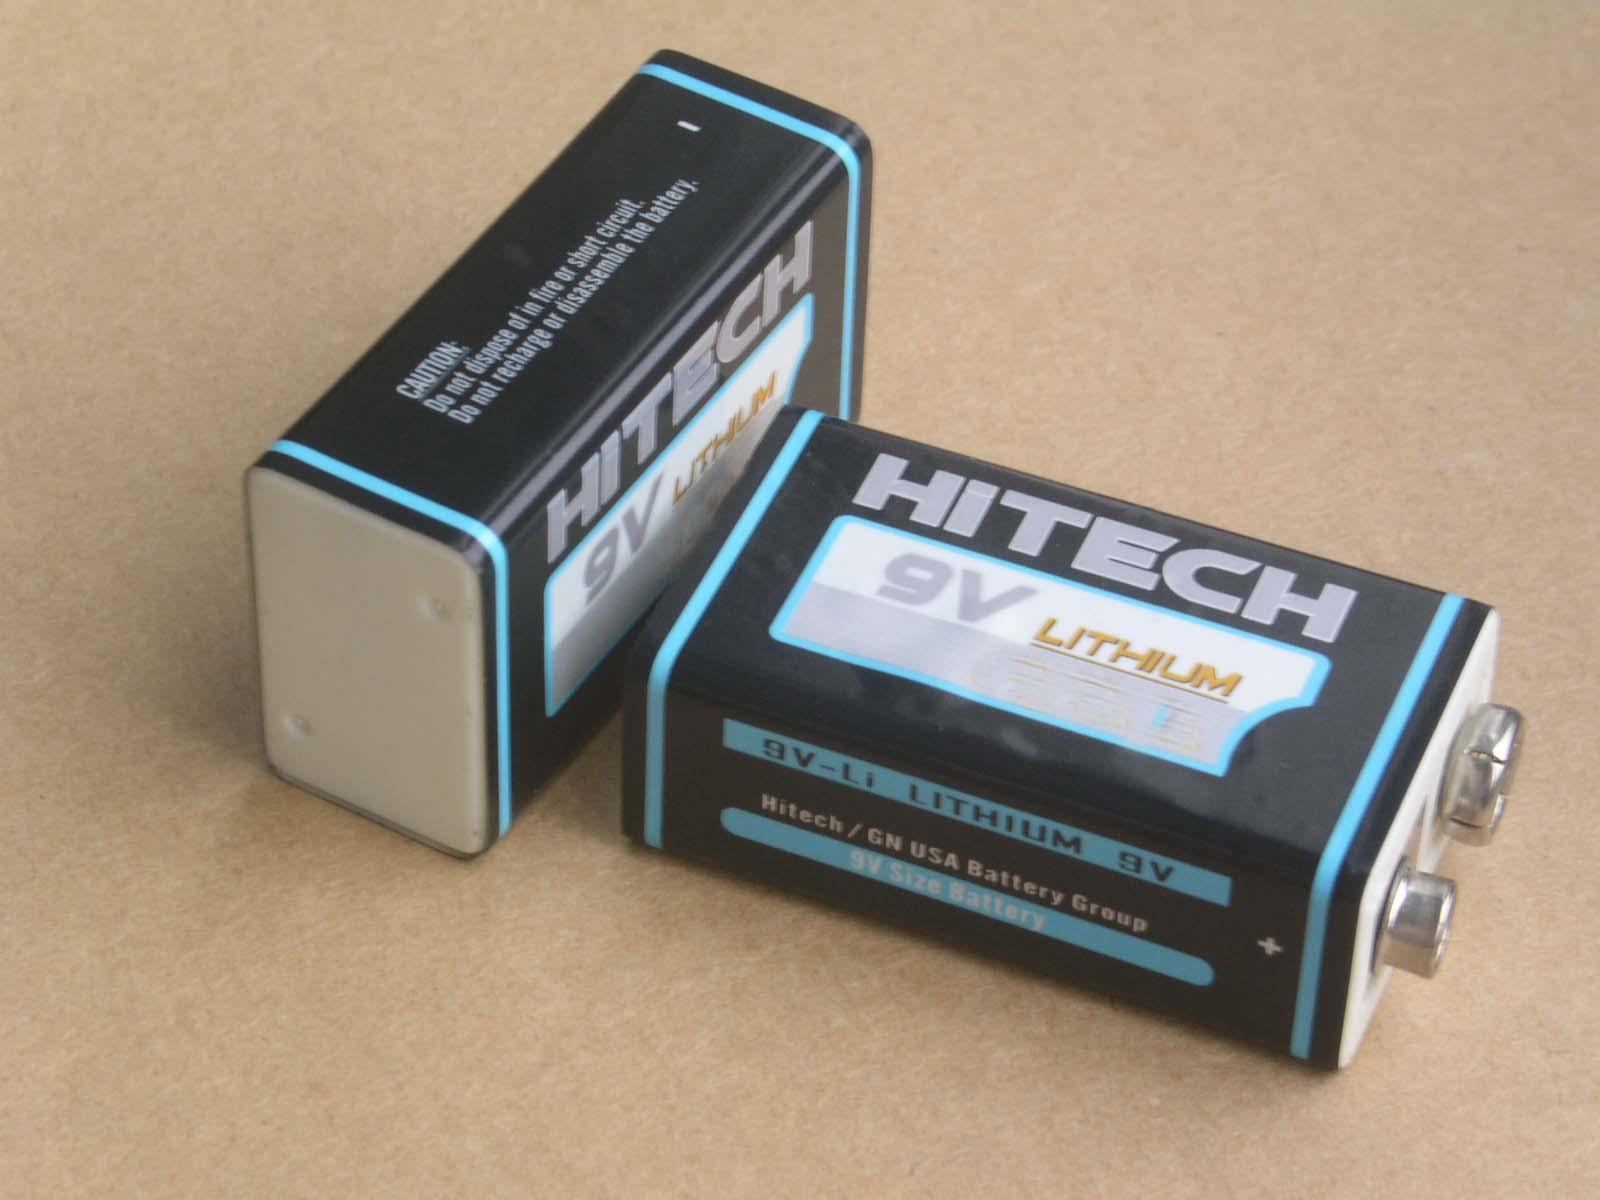 9V lithium batteries 12000mAh lithium battery for smoke alarm